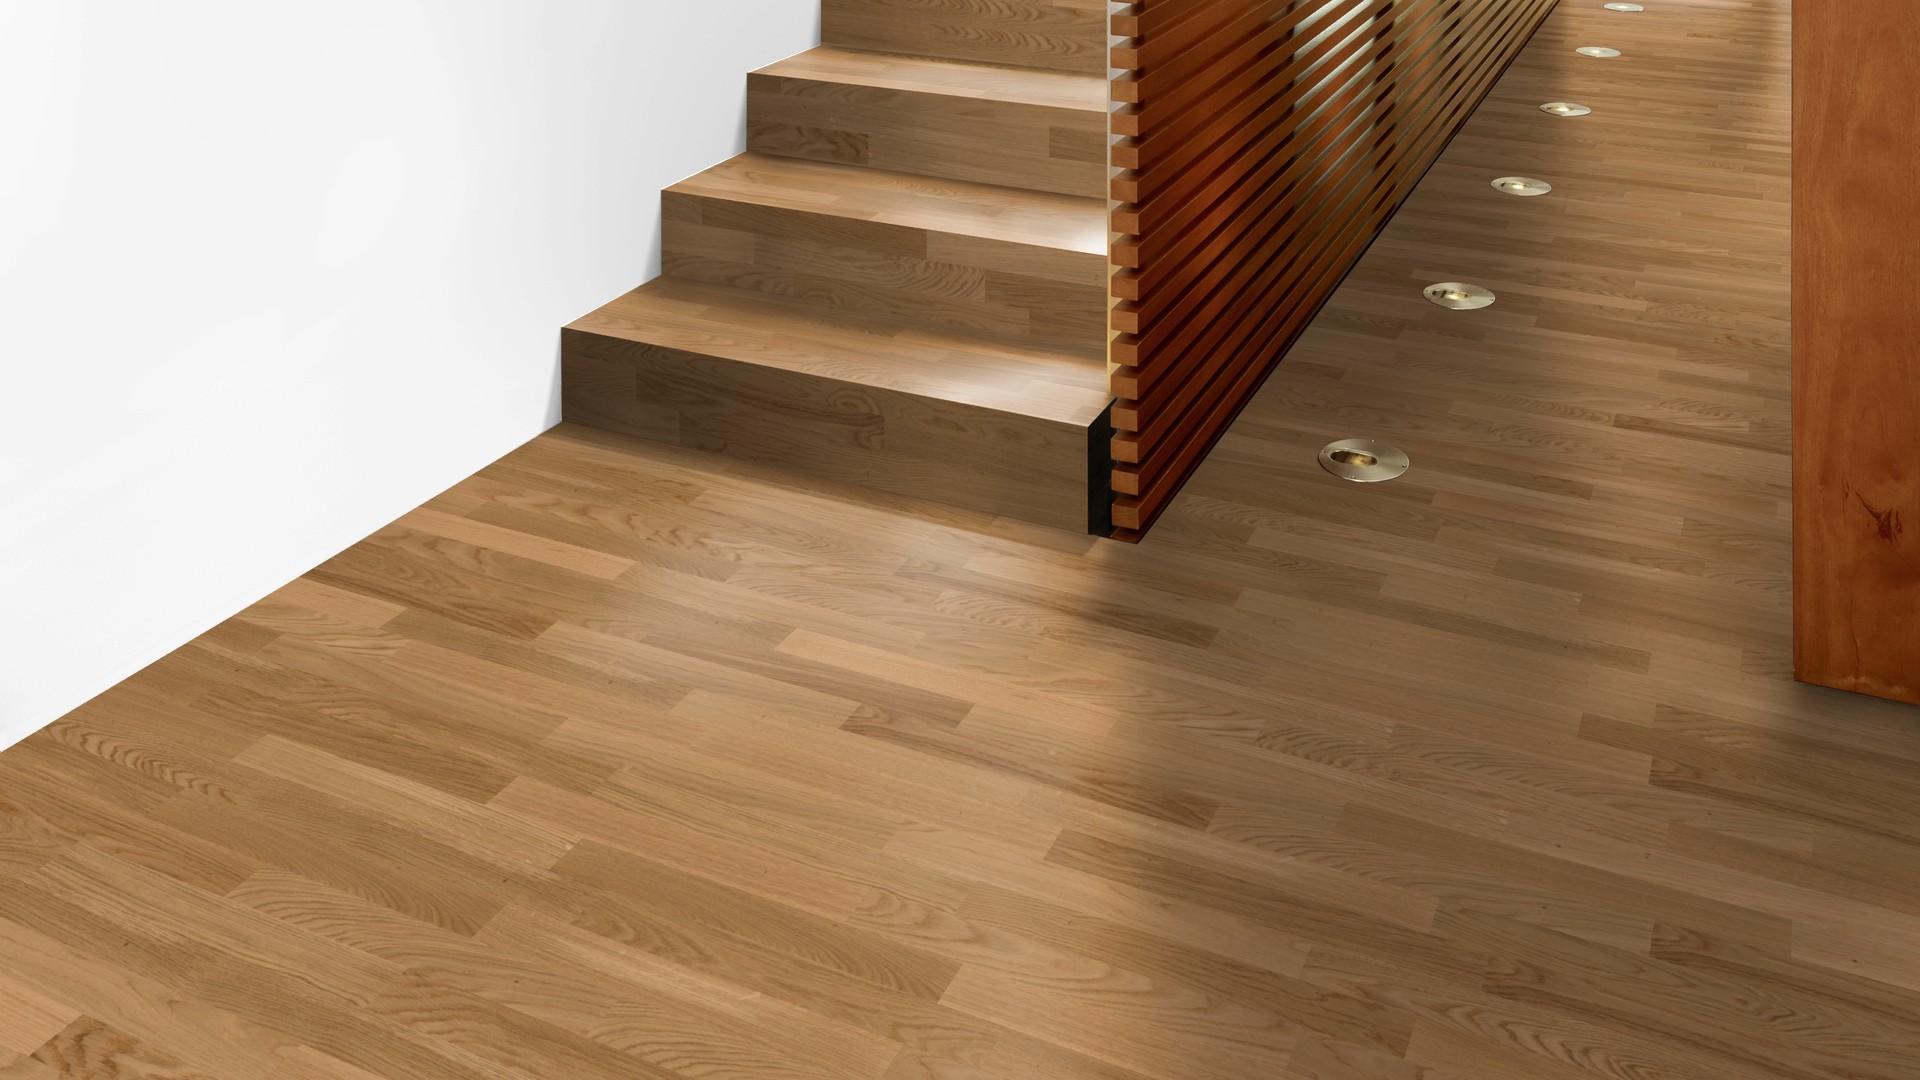 wp 450 eiche ruhig prostrong 18405 weitzer parkett. Black Bedroom Furniture Sets. Home Design Ideas